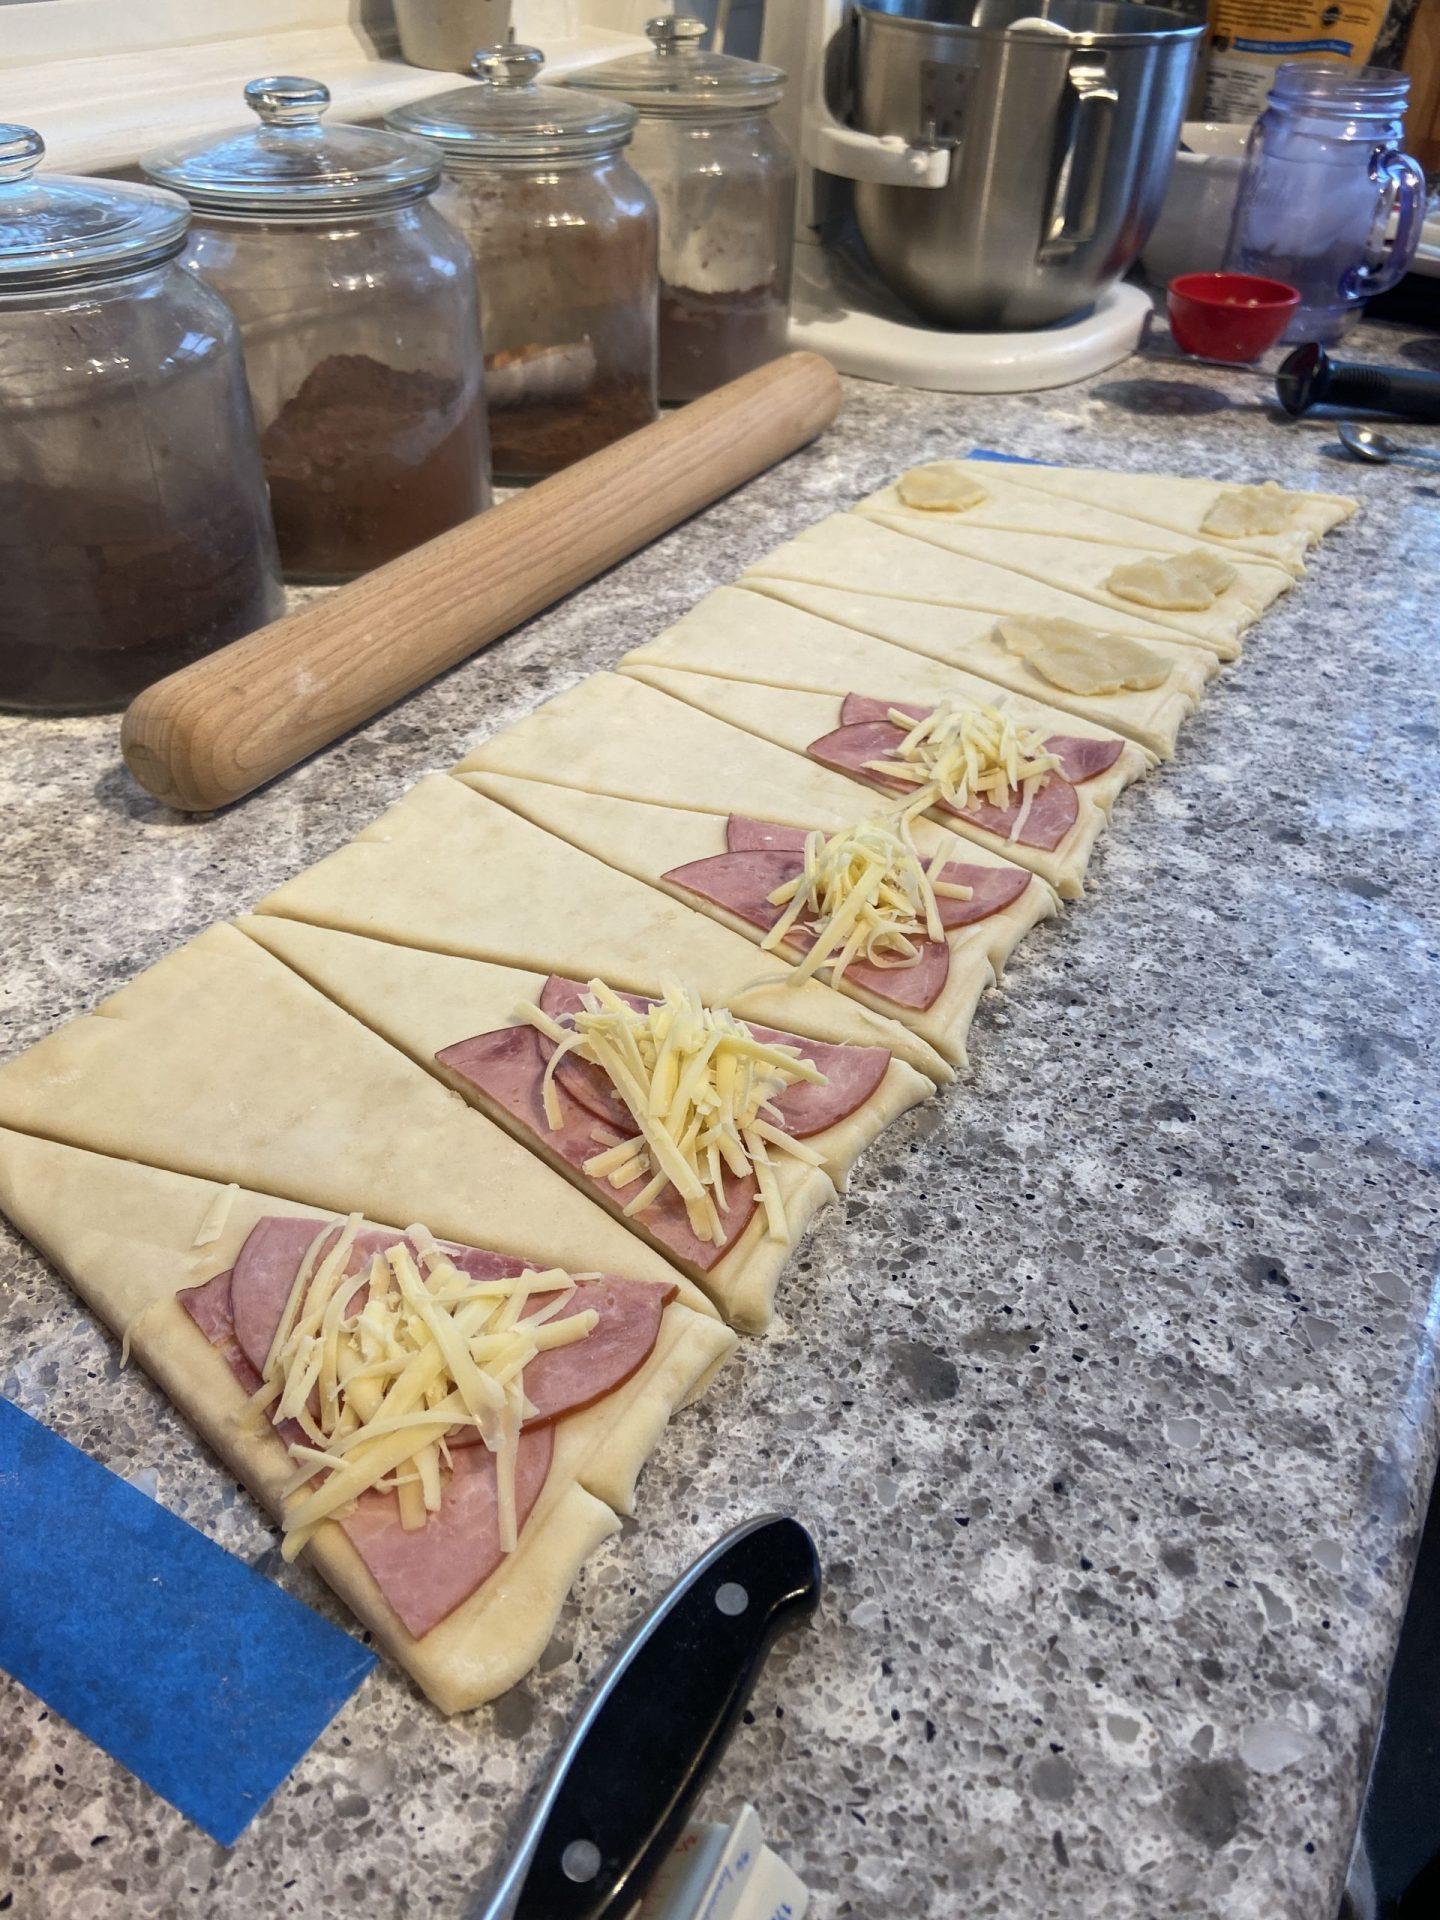 ready to roll croissants eatbaketravel.com